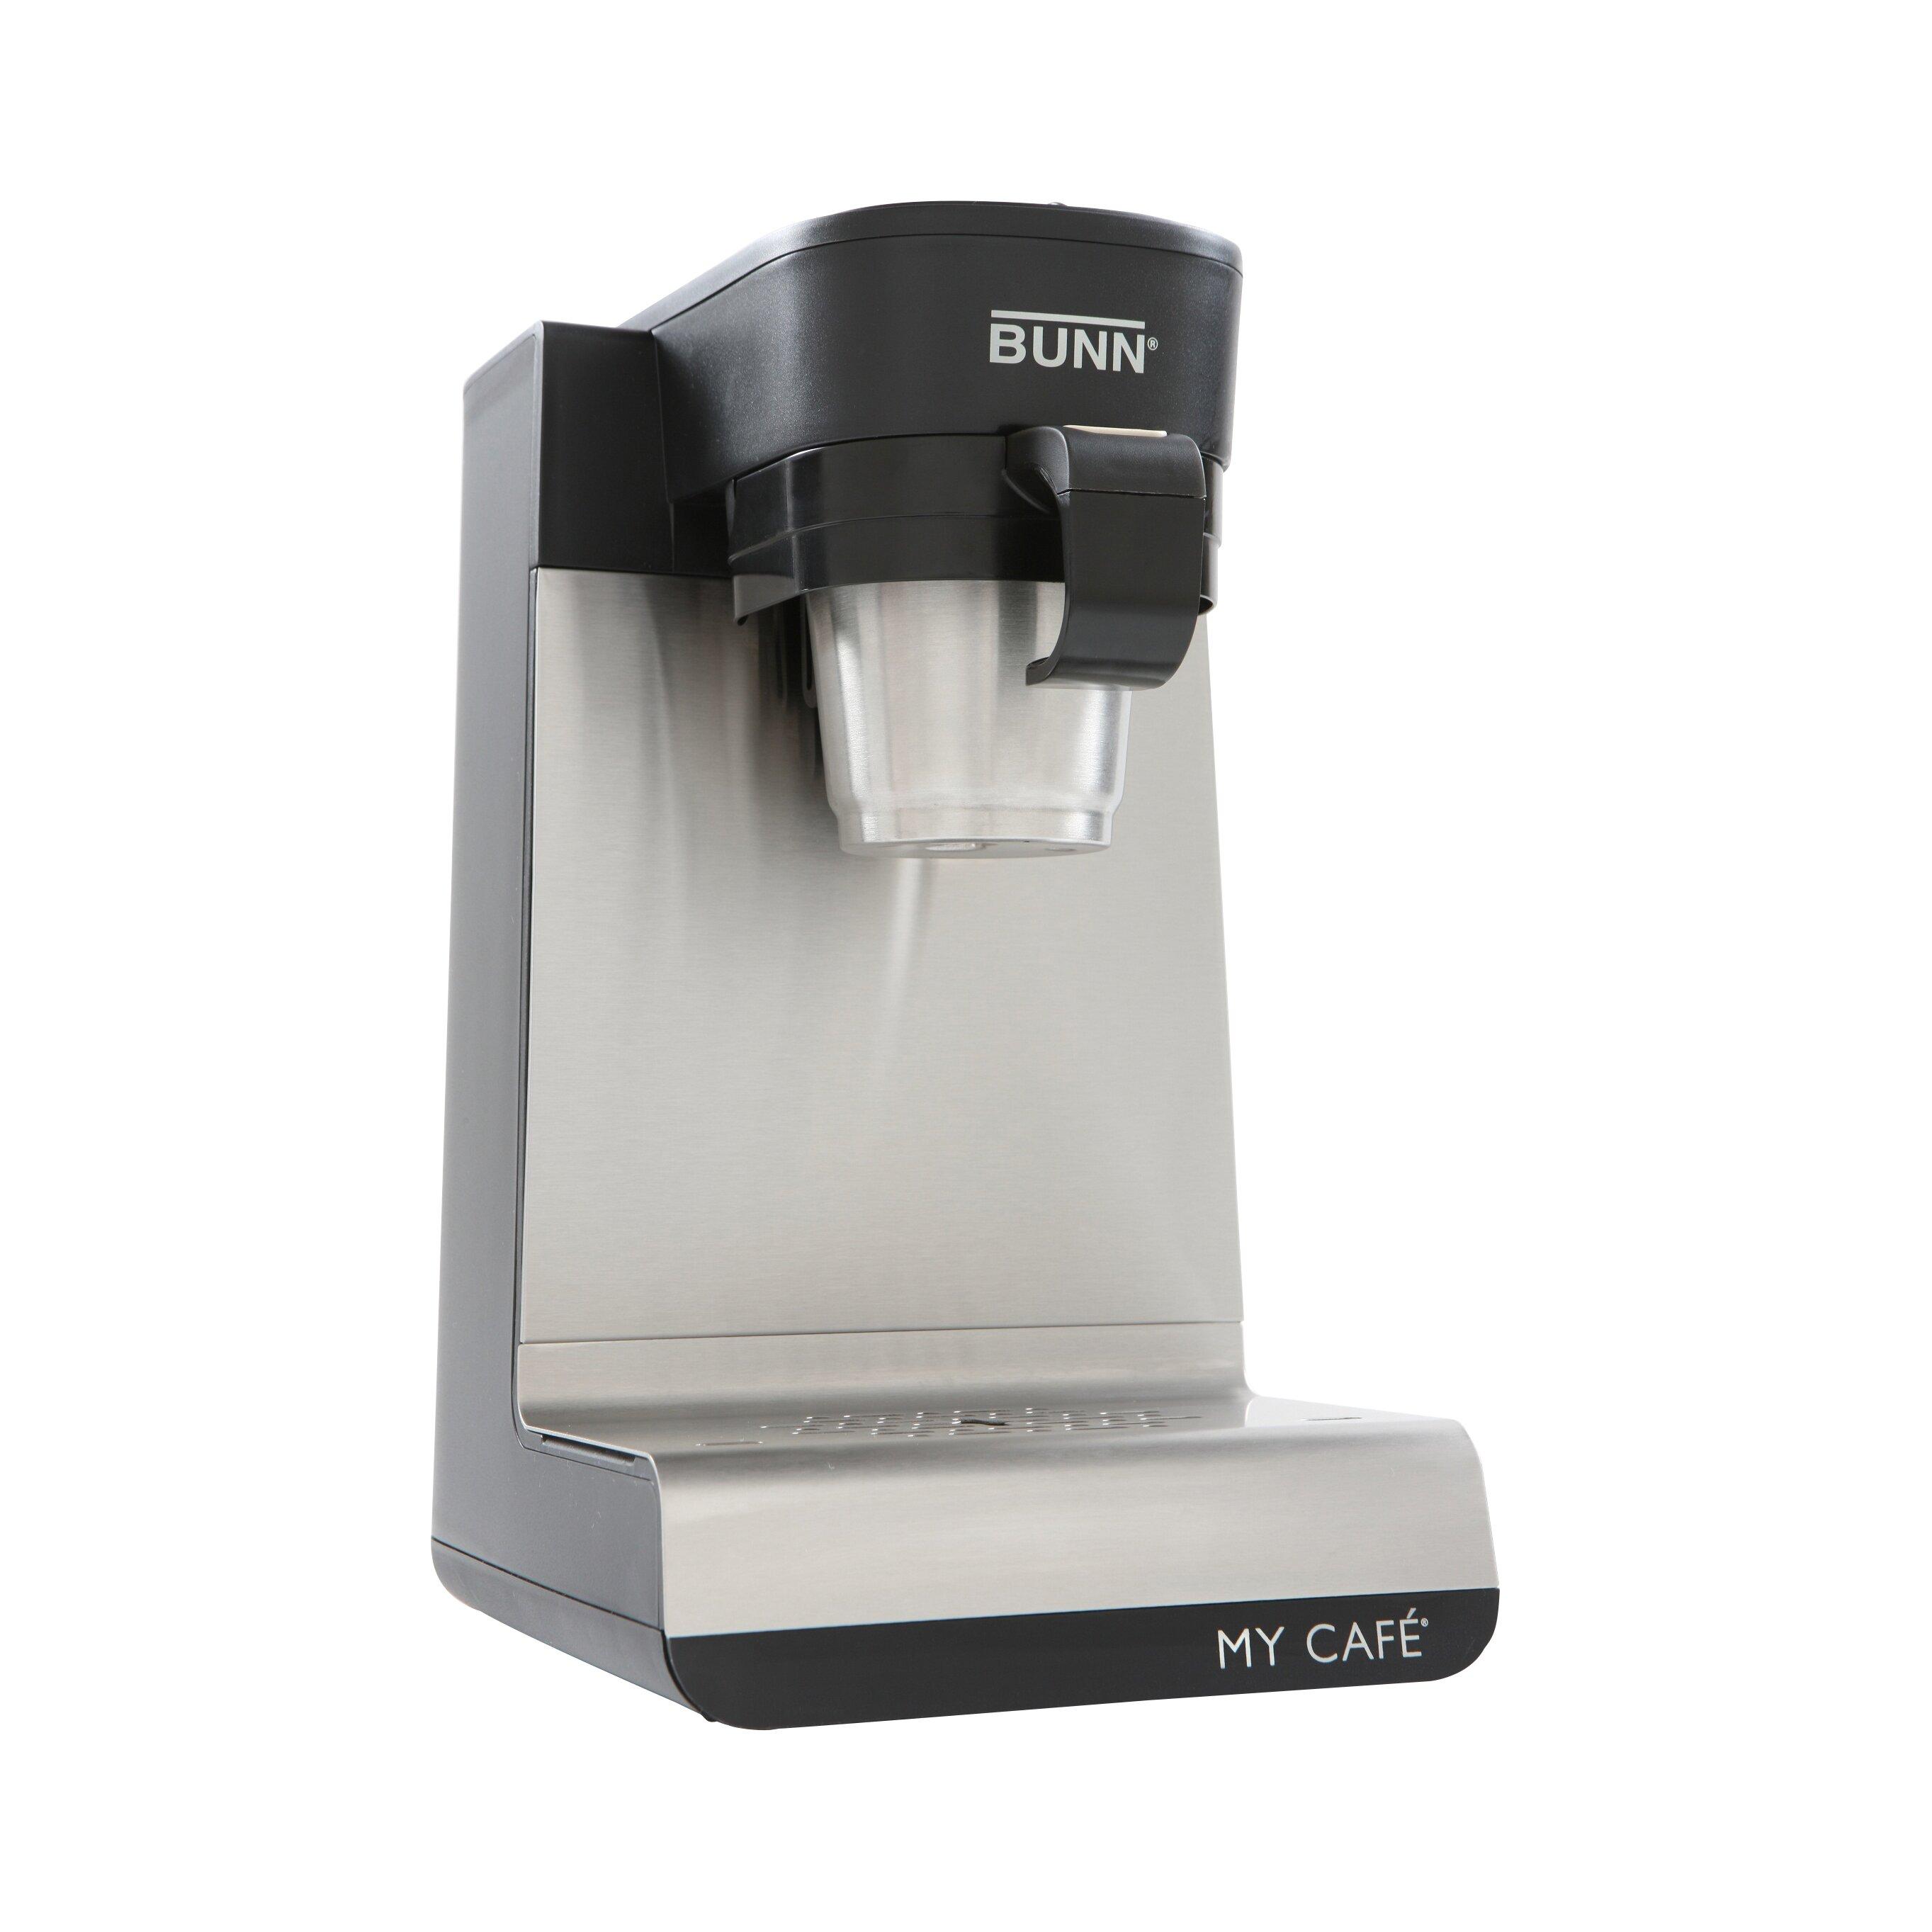 Bunn One Cup Coffee Maker Reviews : Bunn My Cafe Single Cup Multi-Use Home Coffee Maker & Reviews Wayfair